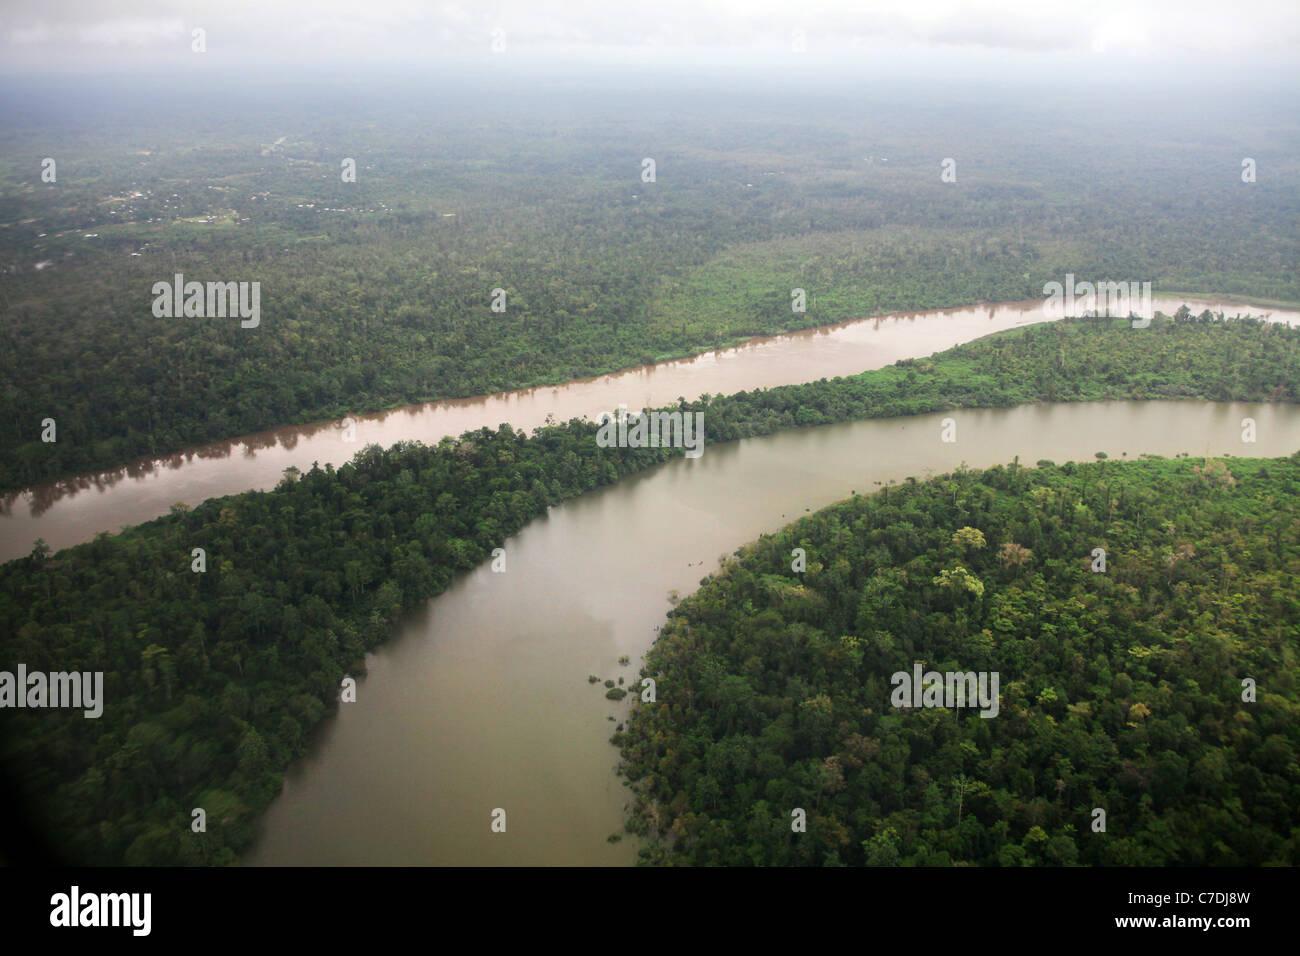 Fliegen Sie Fluss, Regenwald, Western Province (Papua-Neuguinea) Stockbild